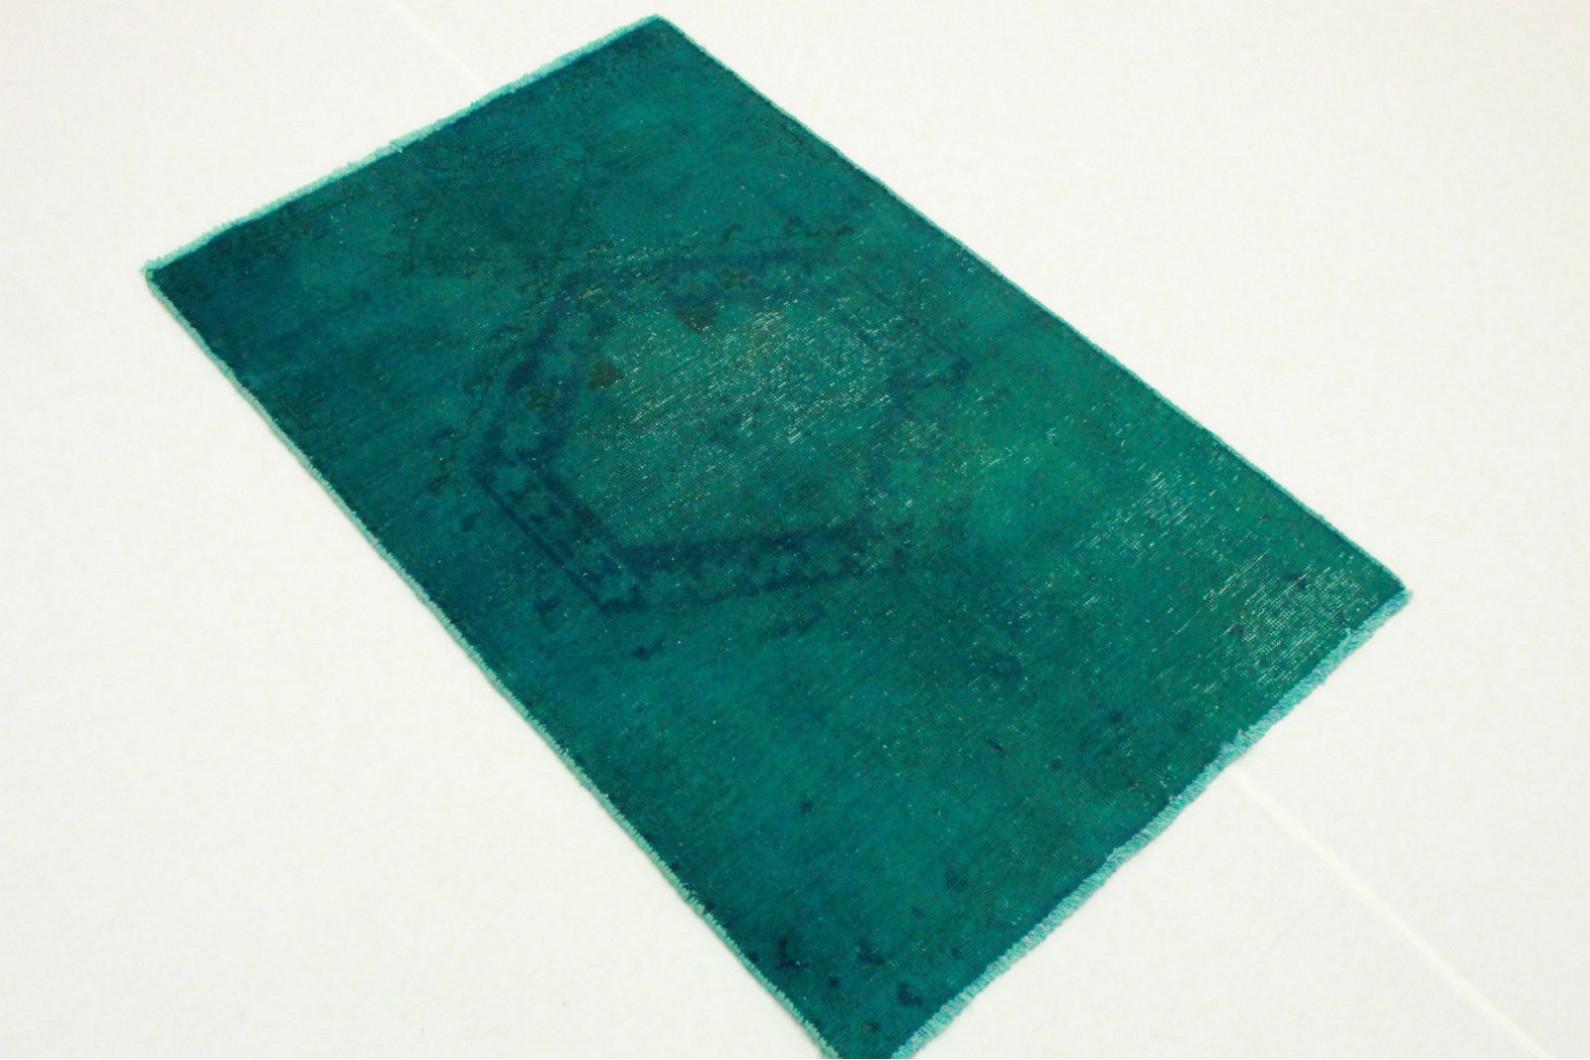 vintage teppich blau t rkis in 130x80cm 1001 3275 bei. Black Bedroom Furniture Sets. Home Design Ideas